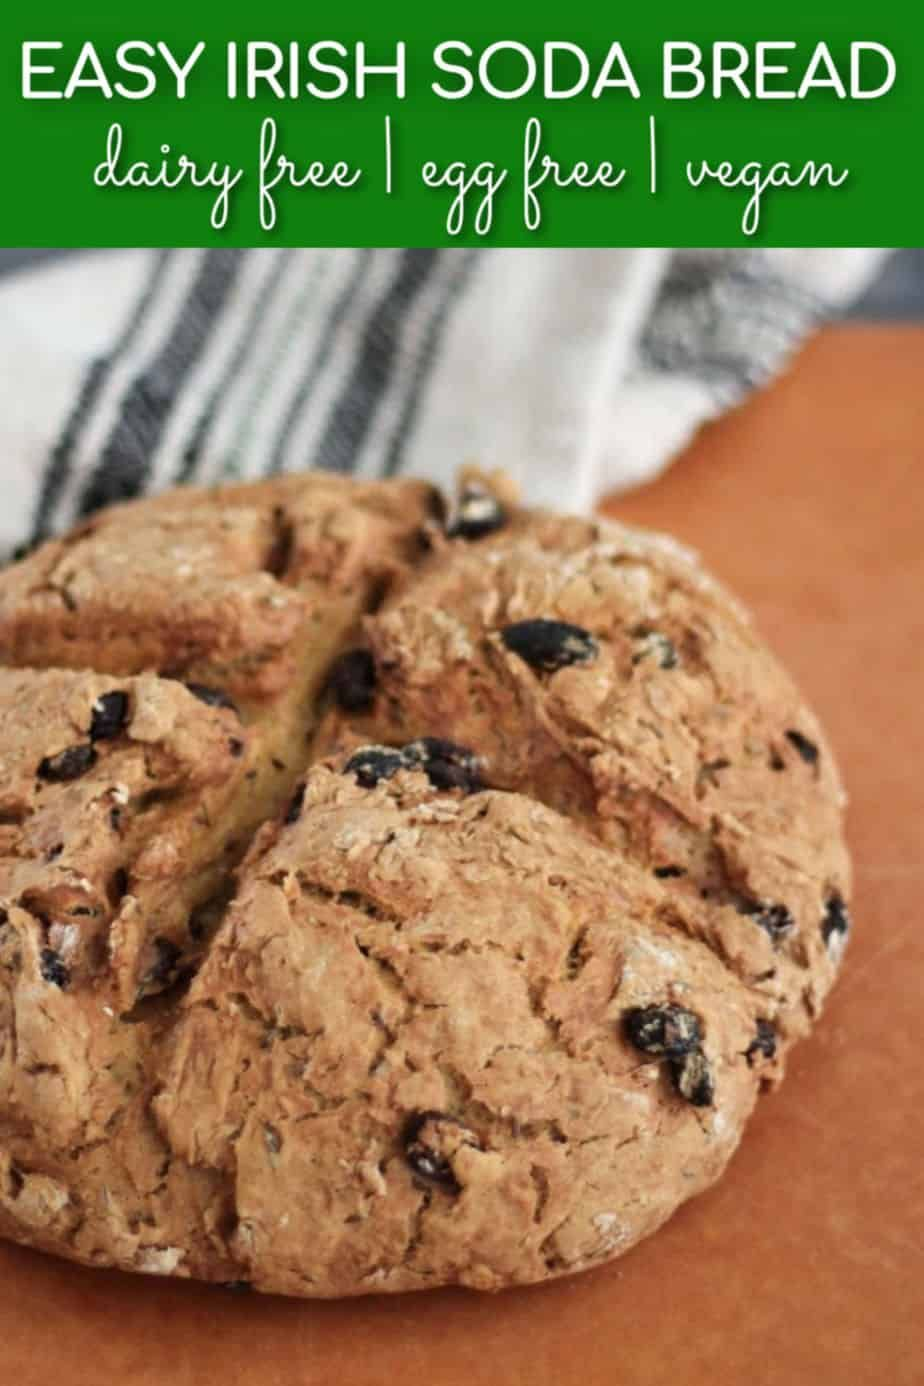 Vegan Irish Soda Bread Recipe With Aquafaba Made Without Buttermilk Yeast Or Eggs In 2020 Aquafaba Recipes Irish Soda Bread Recipe Vegan Soda